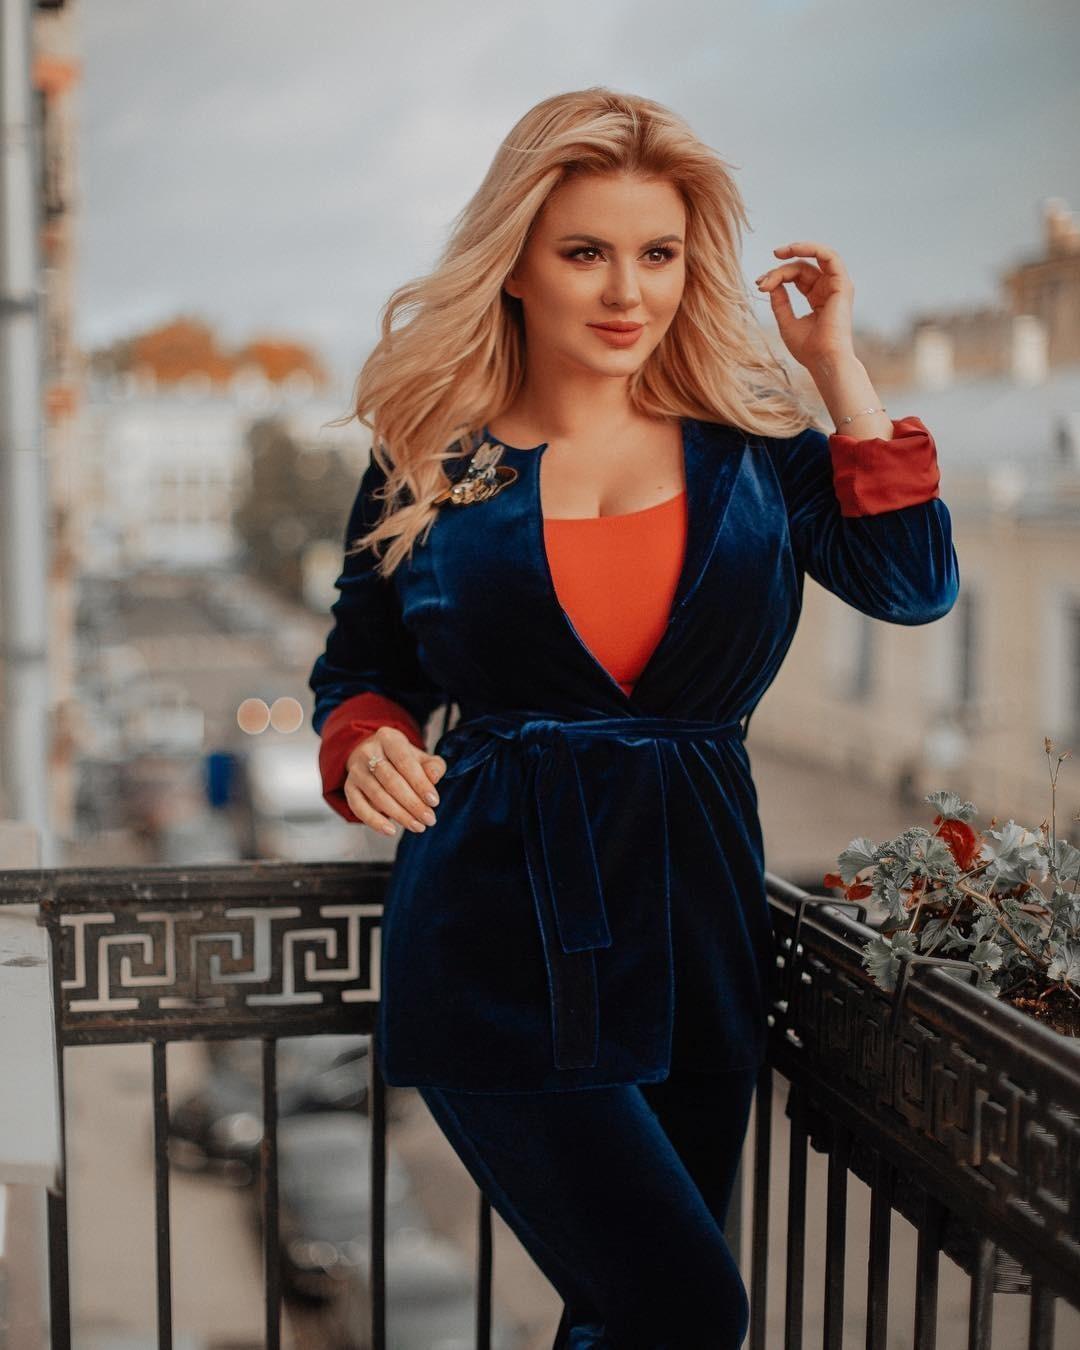 Анна Семенович научилась любить себя после тяжелого разрыва с мужчиной